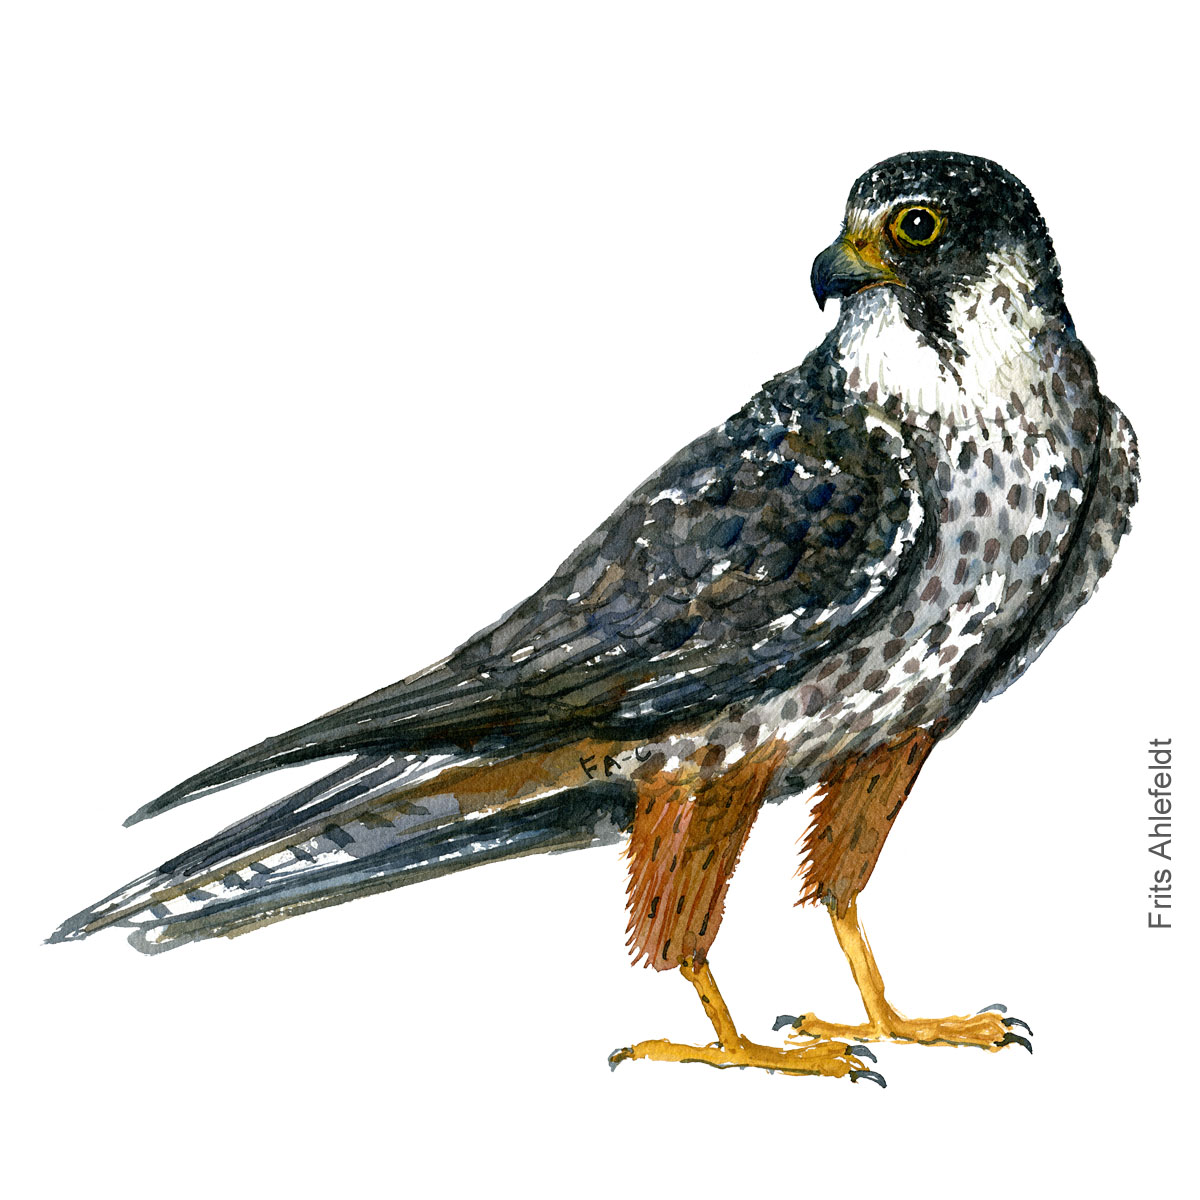 Hobby Falcon - Laerkefalk Akvarel. Watercolor bird illustration by Frits Ahlefeldt